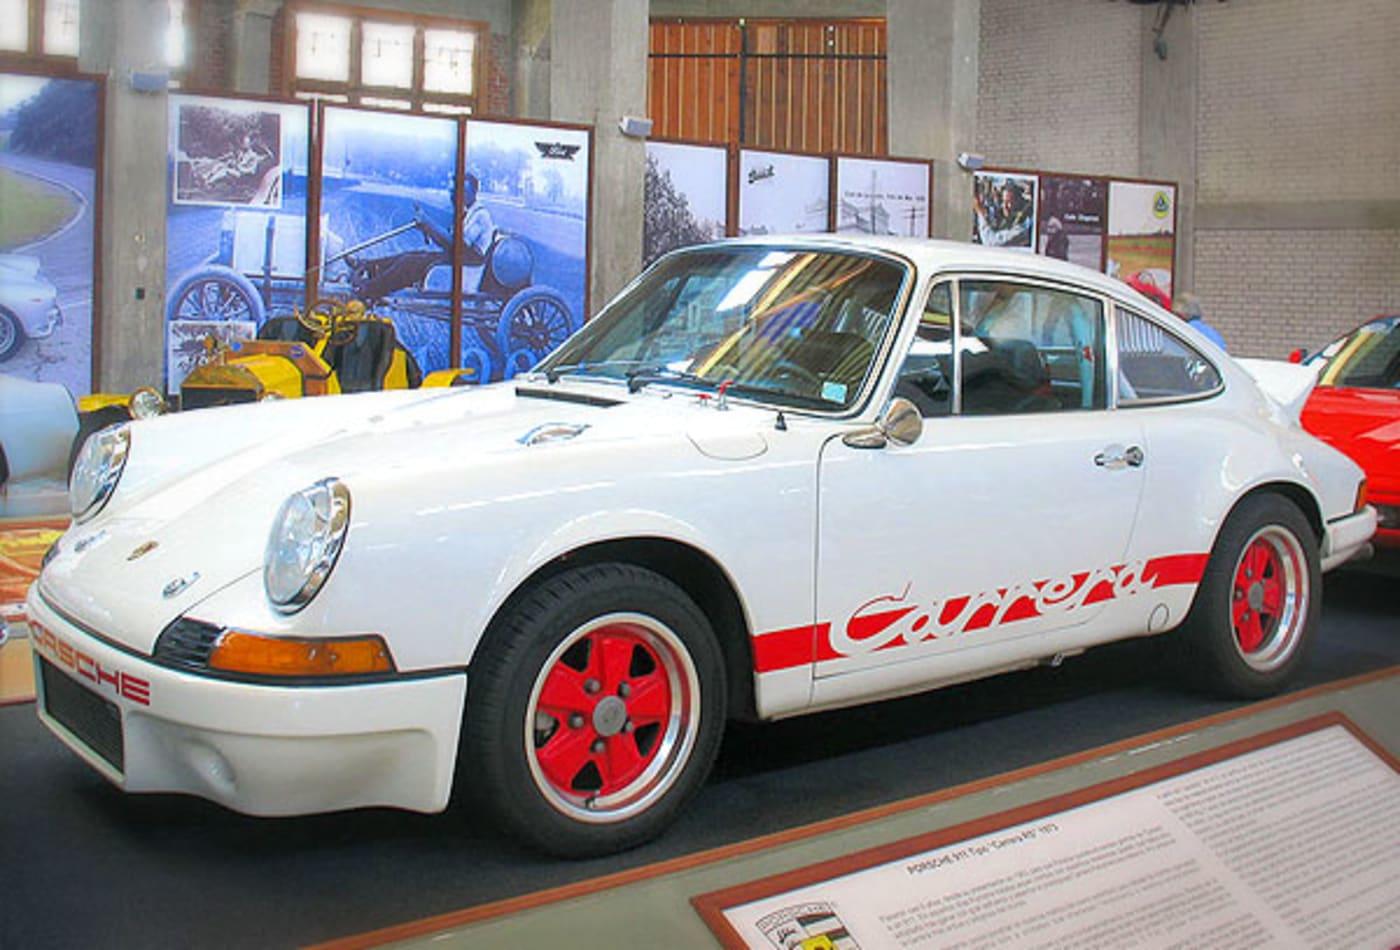 48705398 Porsche-Carrera-RS-Top-10-Best-Looking-Cars-All-Time-CNBC.jpg